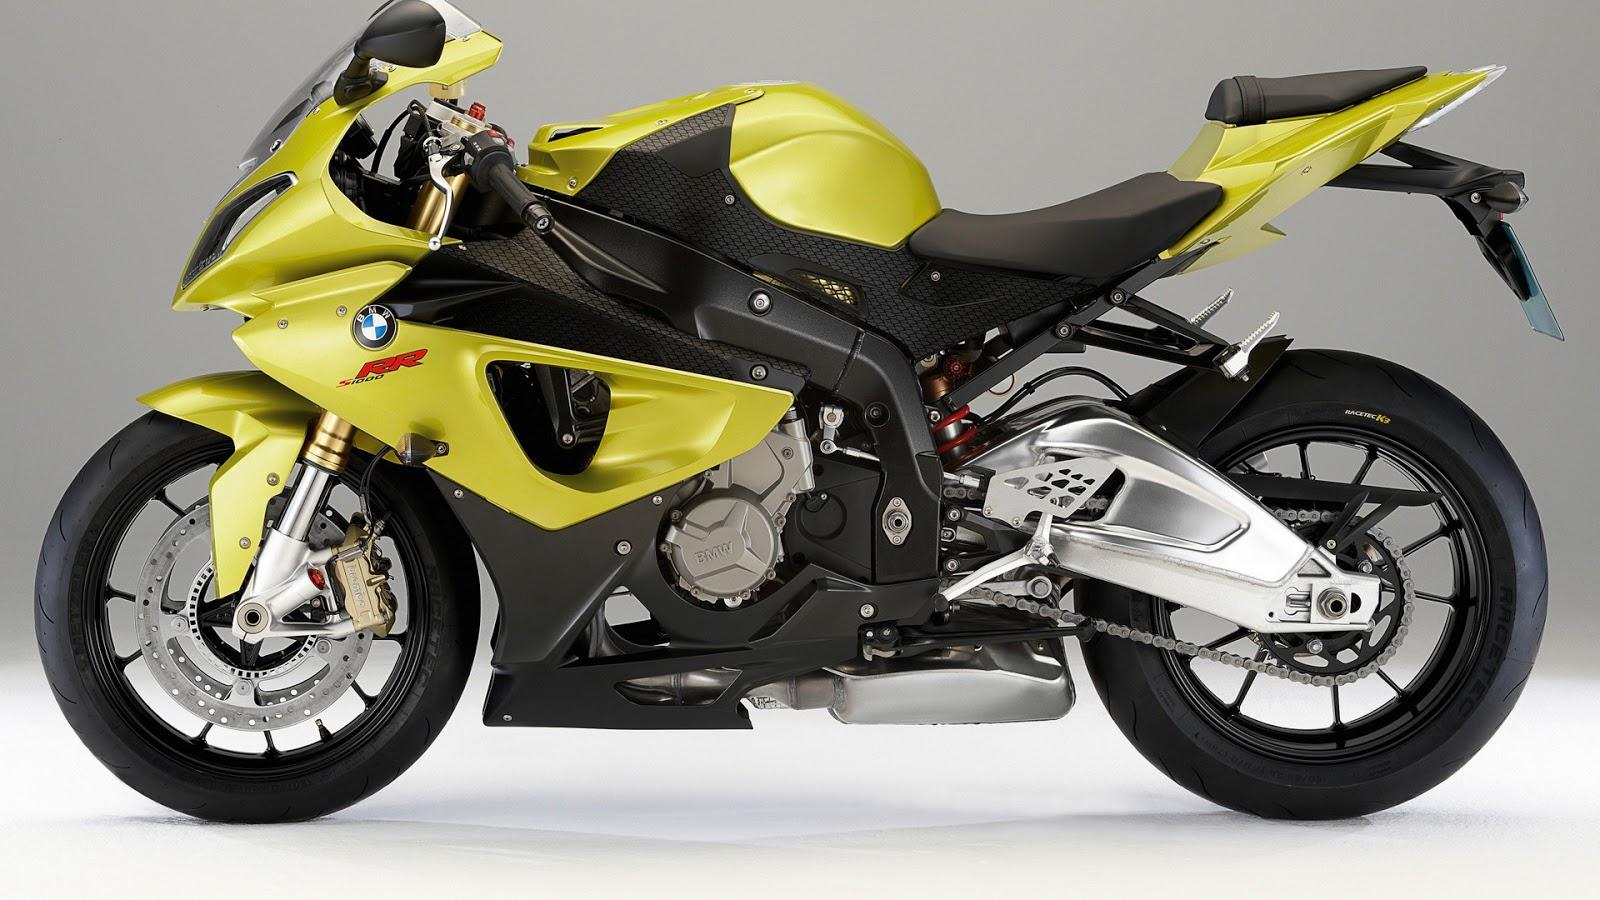 Bmw S1000rr World S Fastest Super Bike Hd Wallpapers